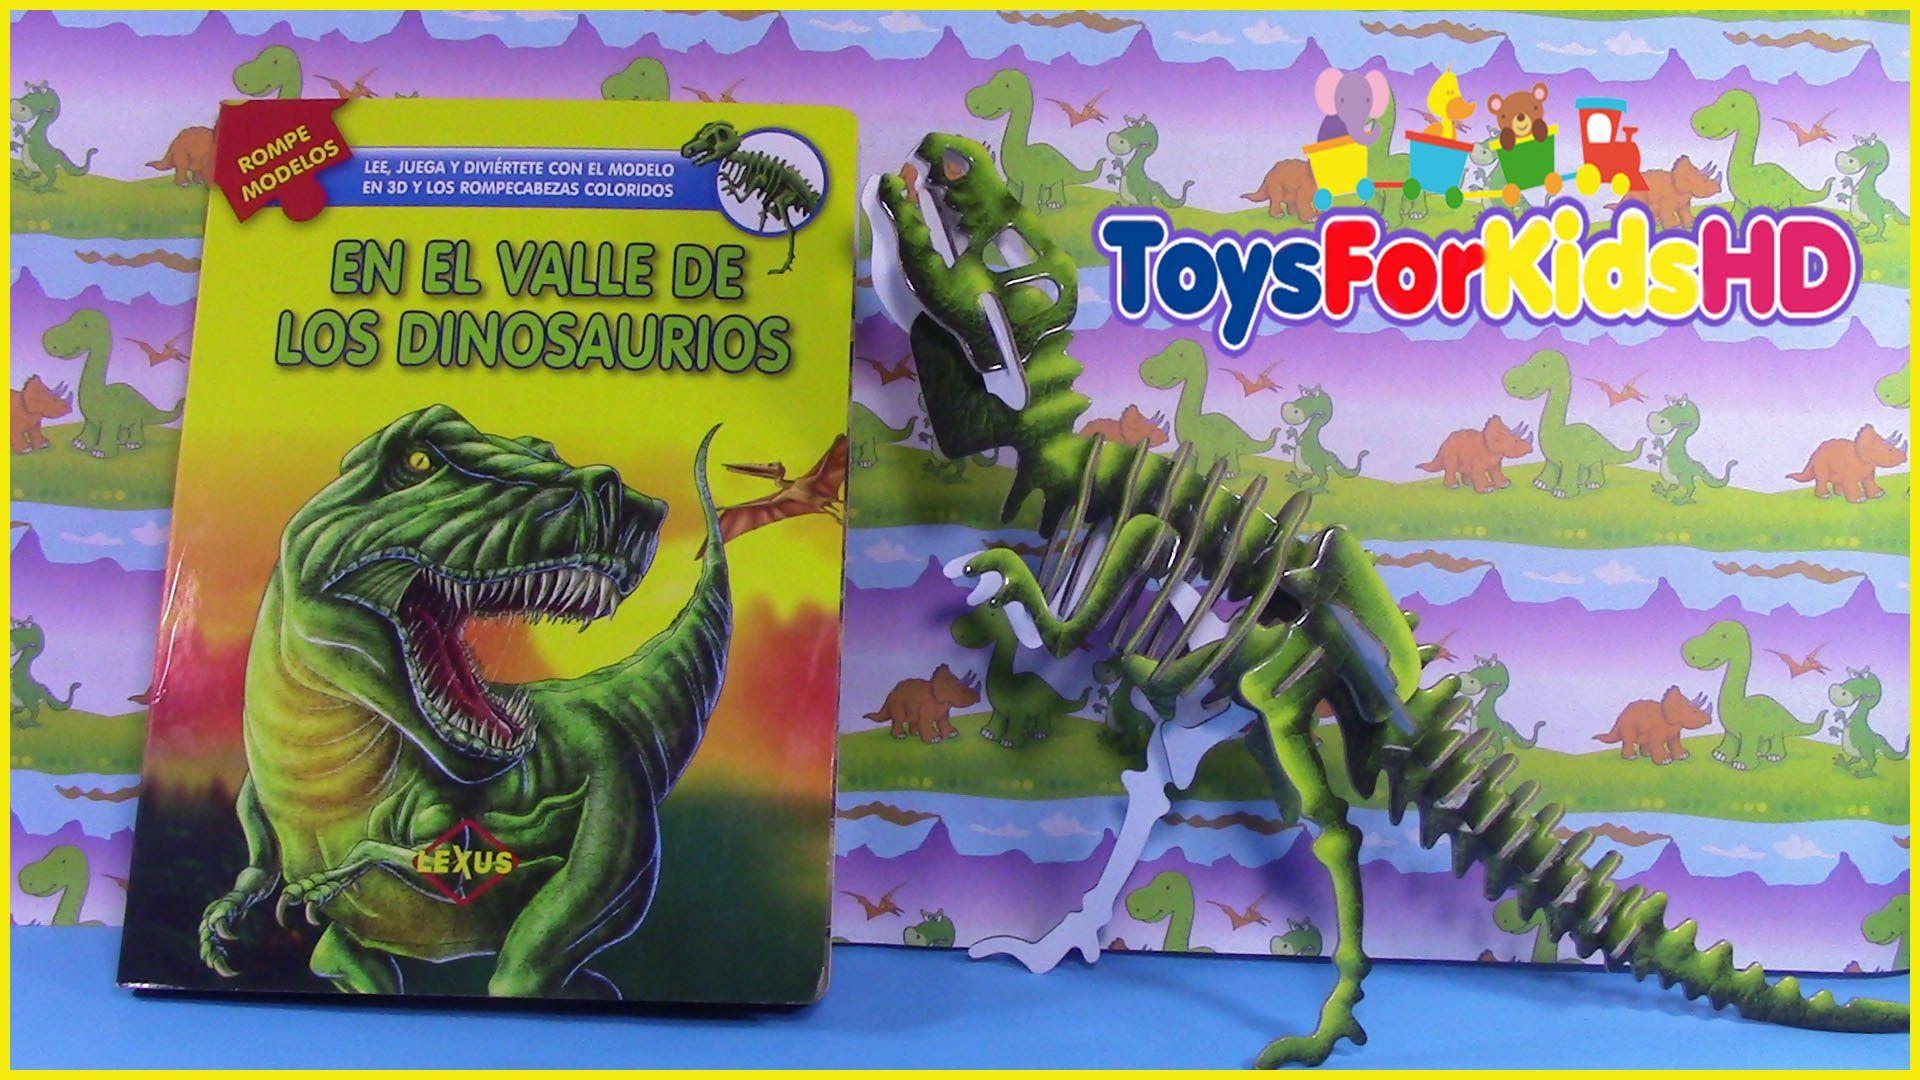 Juguetes Para Dinosaurios De Libros Dqhxotscrb Niños Videos shdrtQ